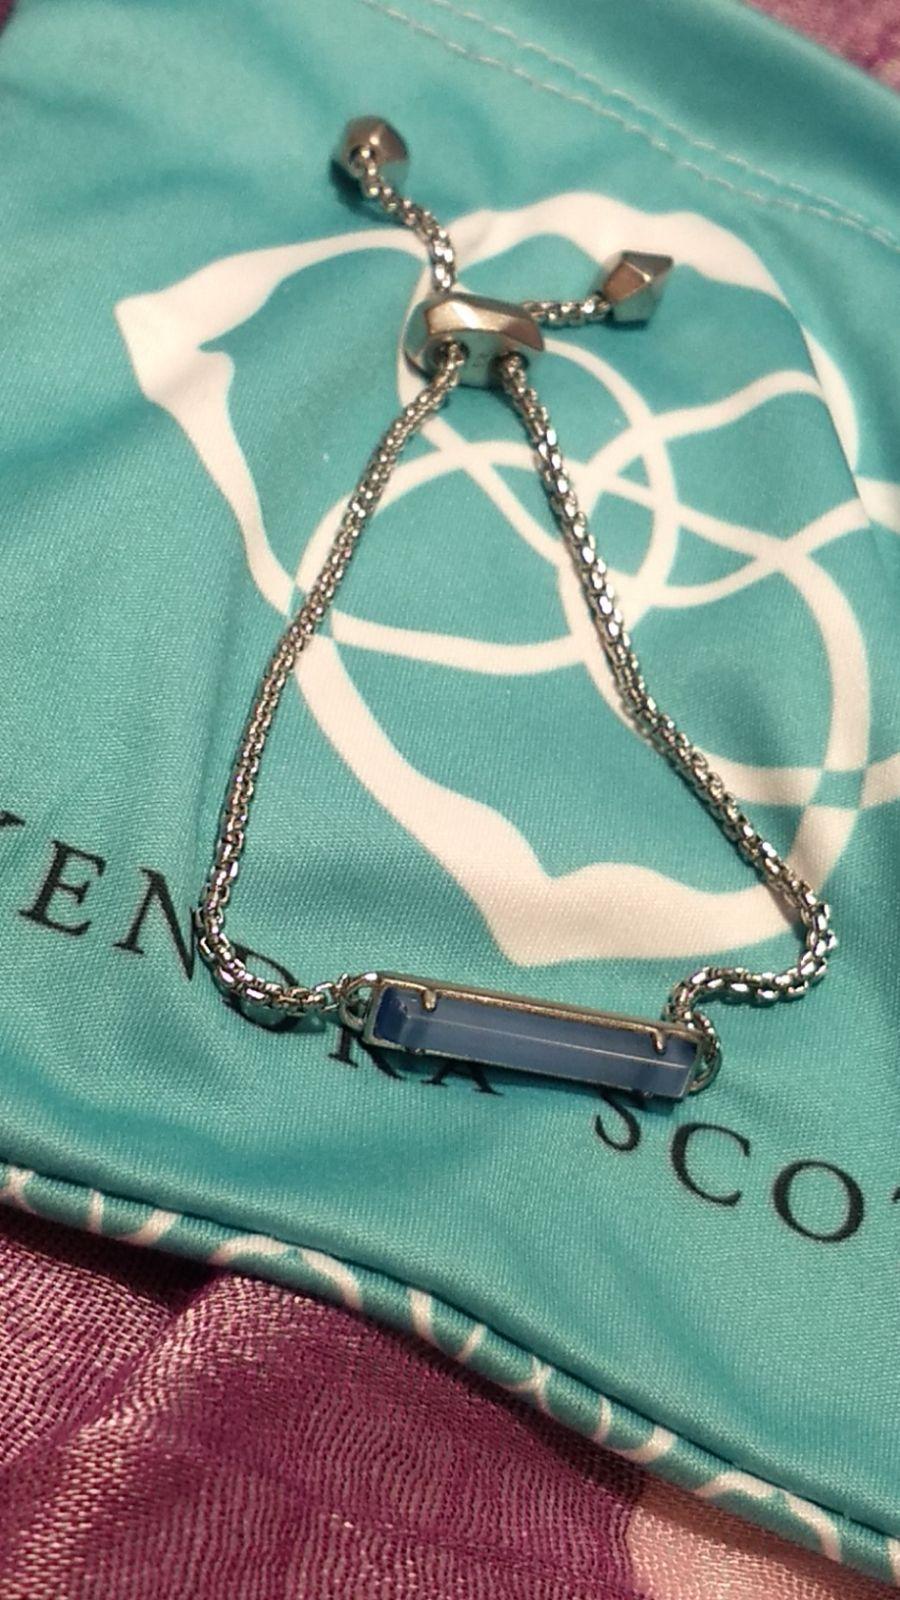 Kendra Scott Stan Silver Adjustable Chain Bracelet in Iridescent Drusy